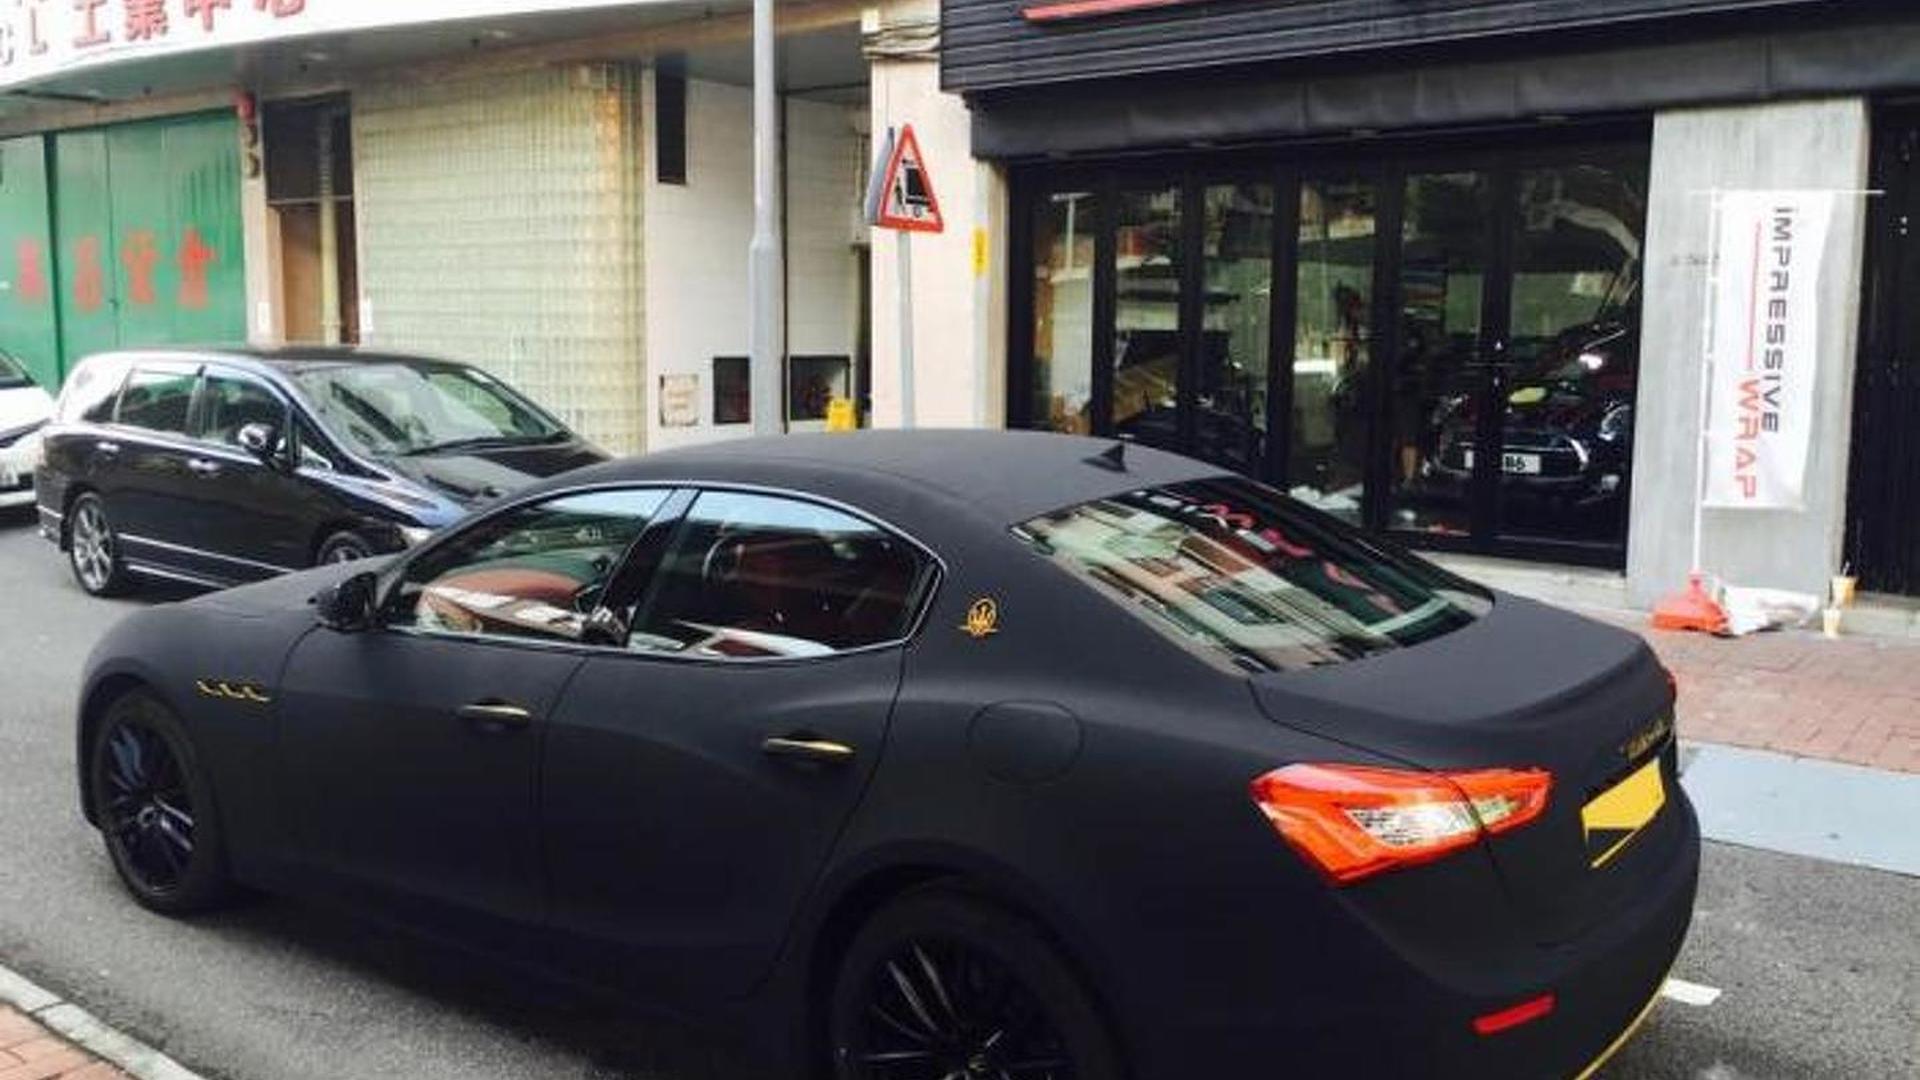 Maserati Ghibli With Matte Black Suede Wrap Looks Striking